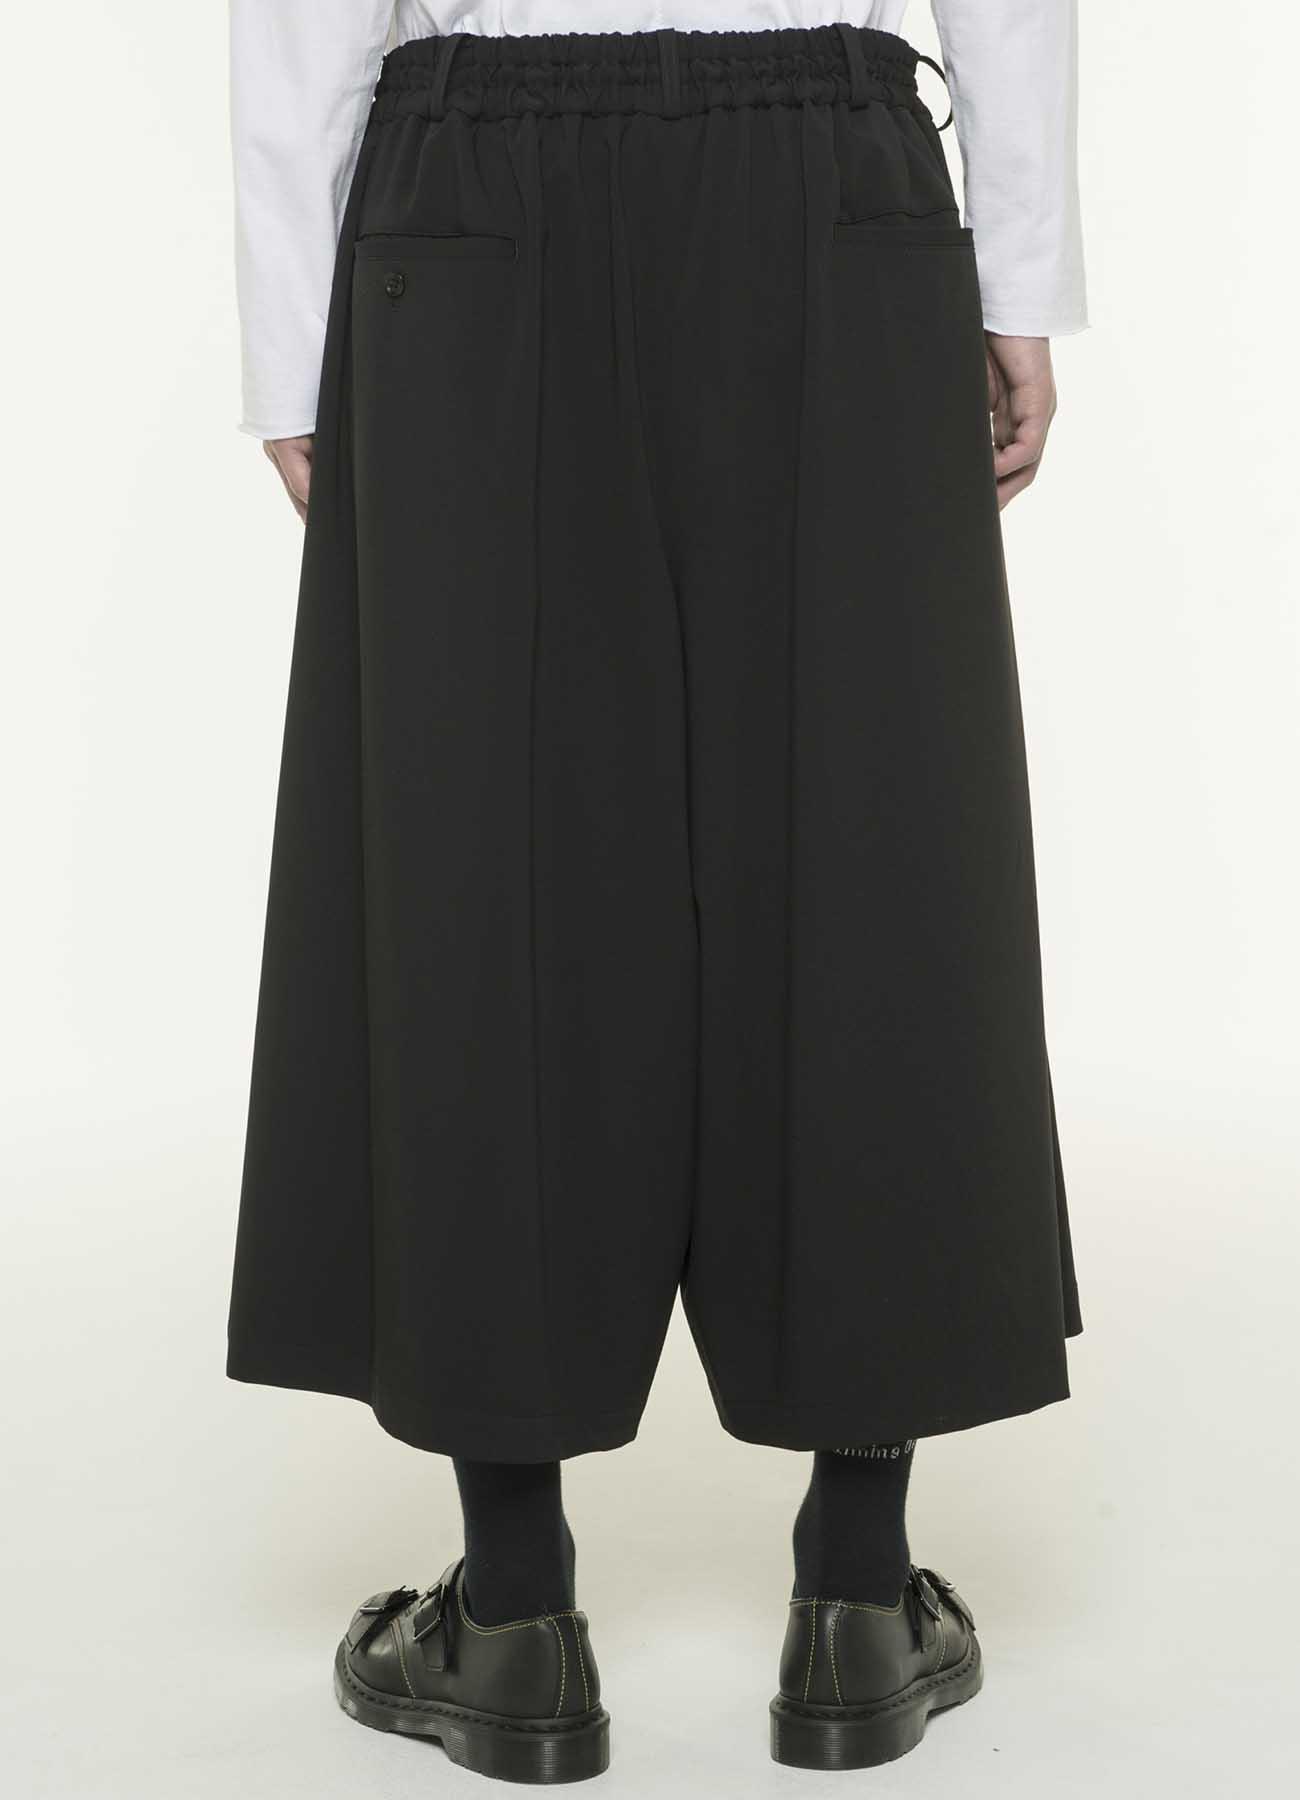 Pe/Rayon Gabardine Stretch Culotte Pants